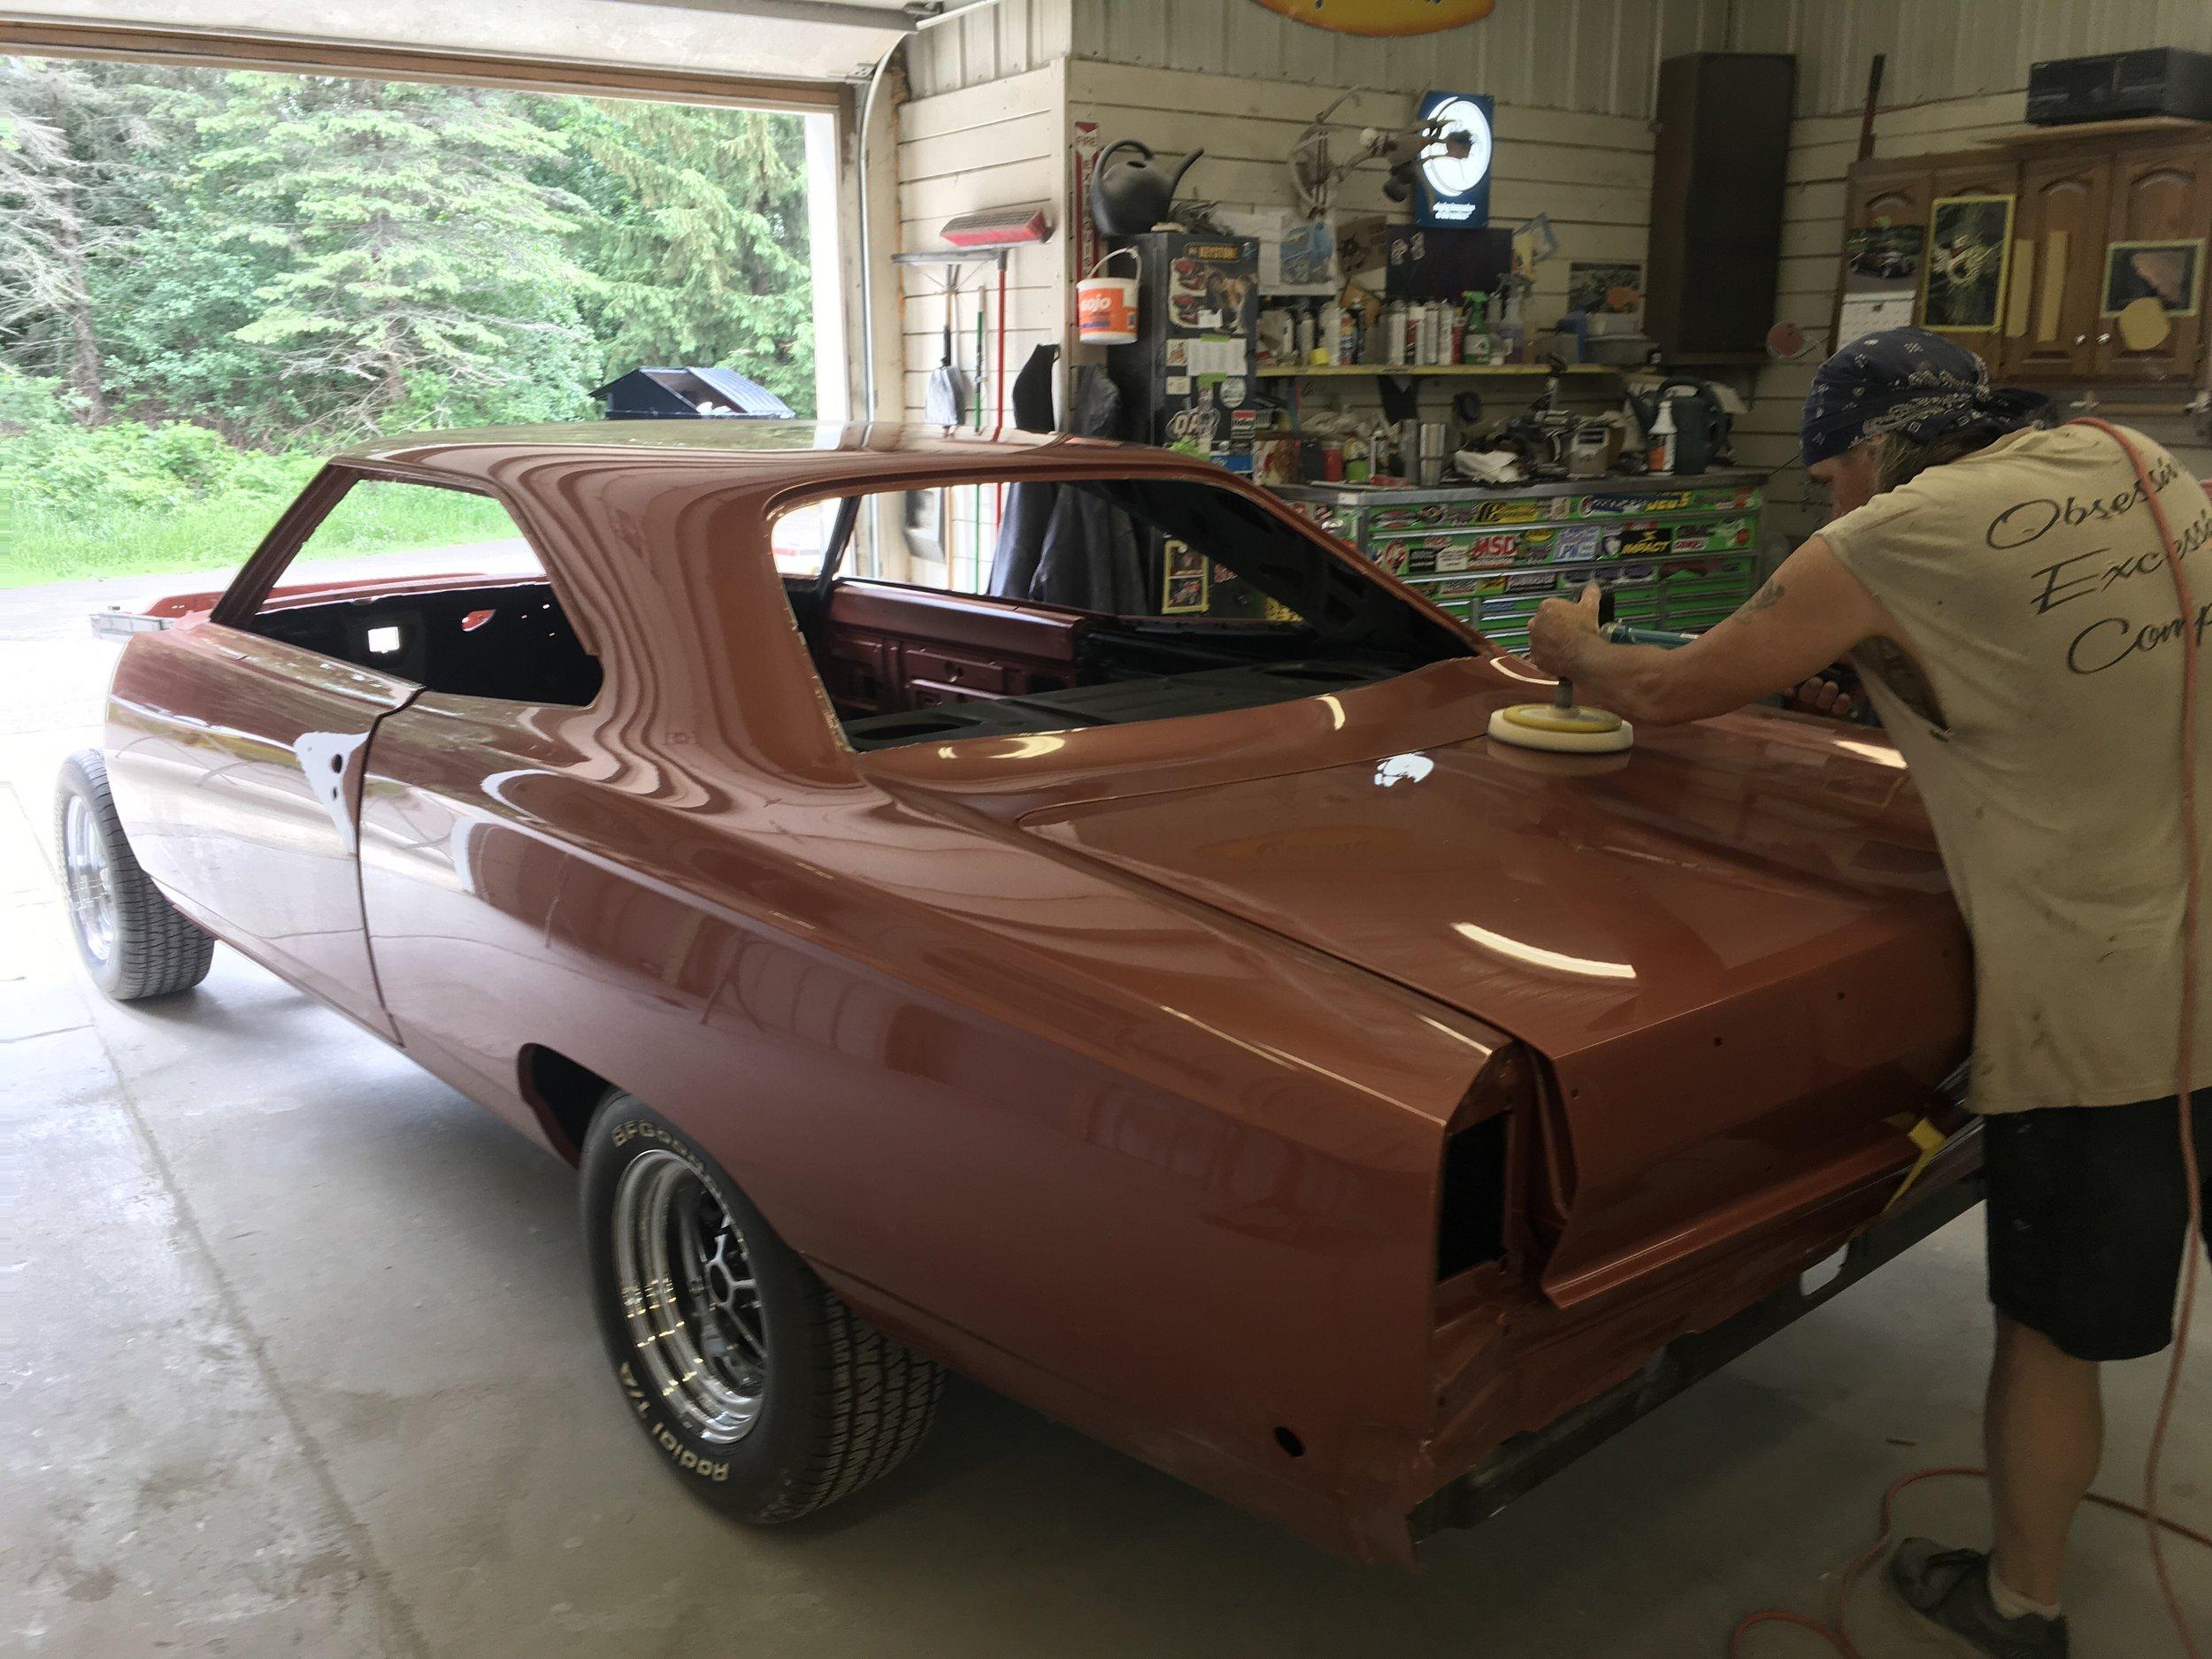 1968-Plymouth-GTX-minneapolis-custom-built-hot-rod-restoration.jpg